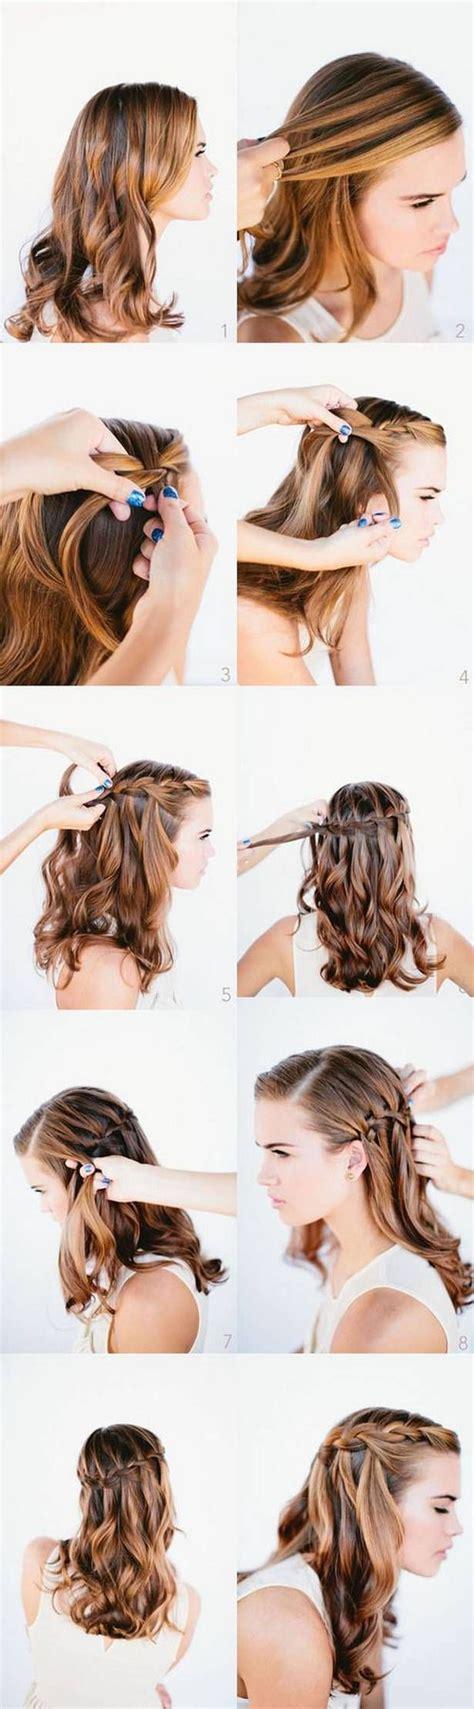 easy hairstyles  long hair    home step  step